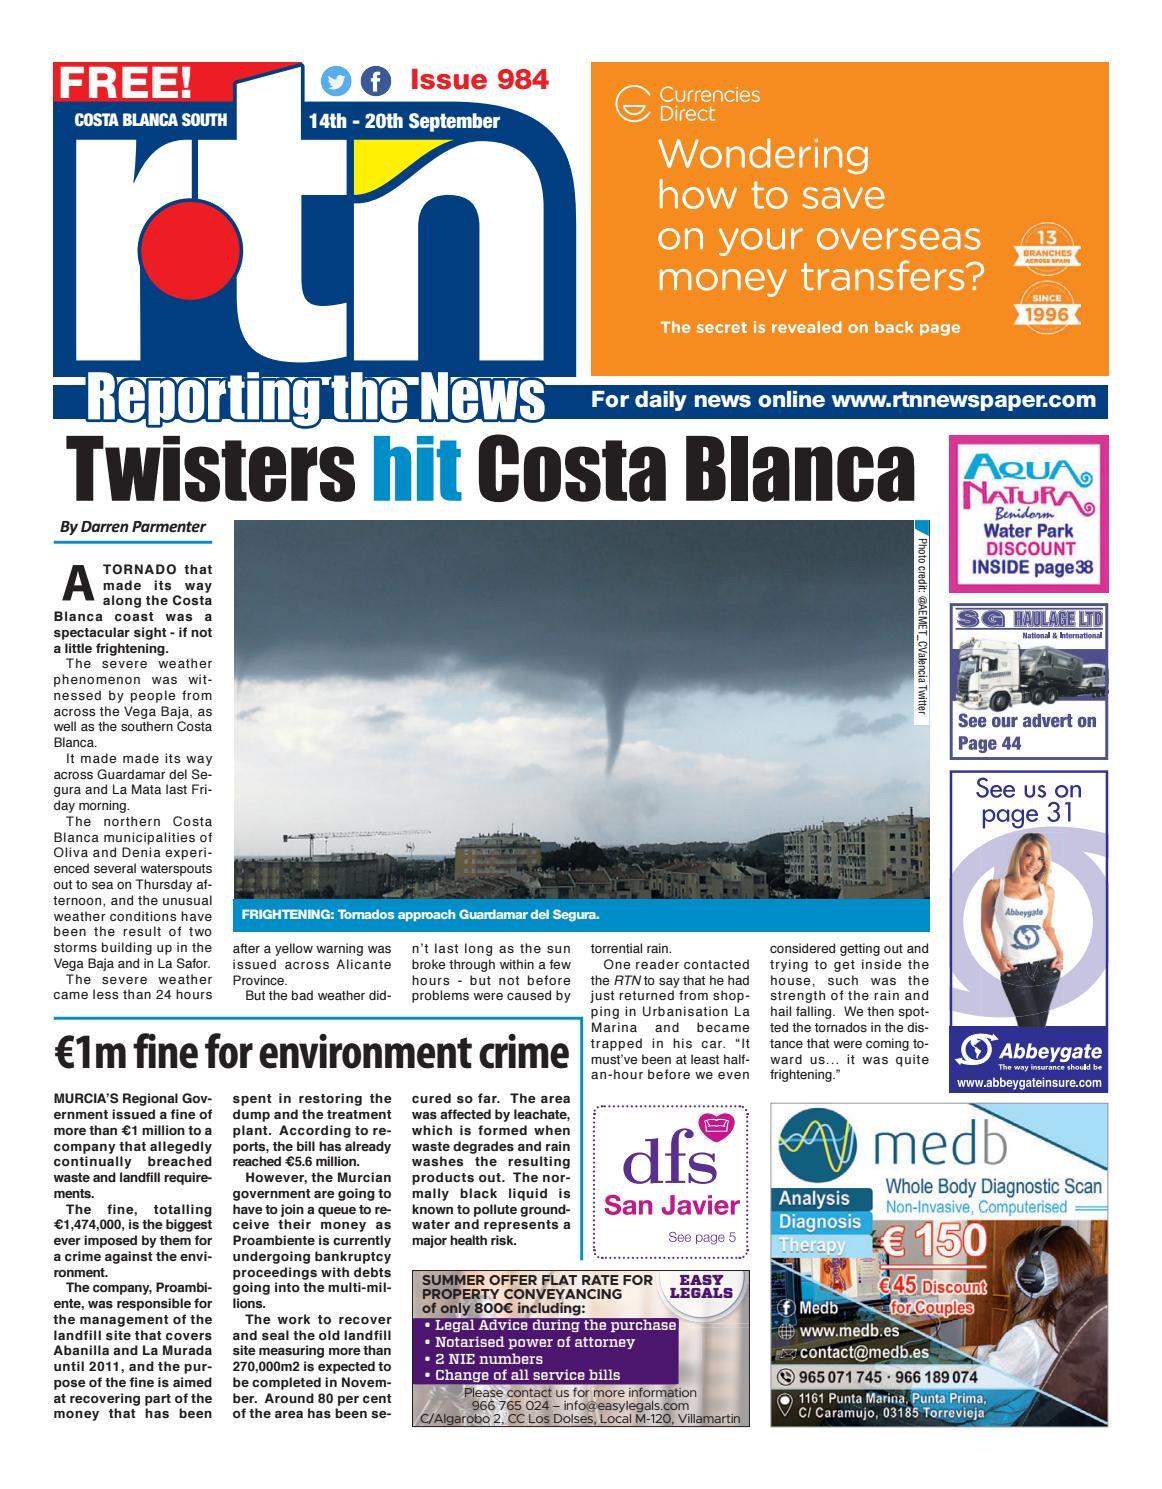 RTN Newspaper - Costa Blanca South 14 - 20 September 2018